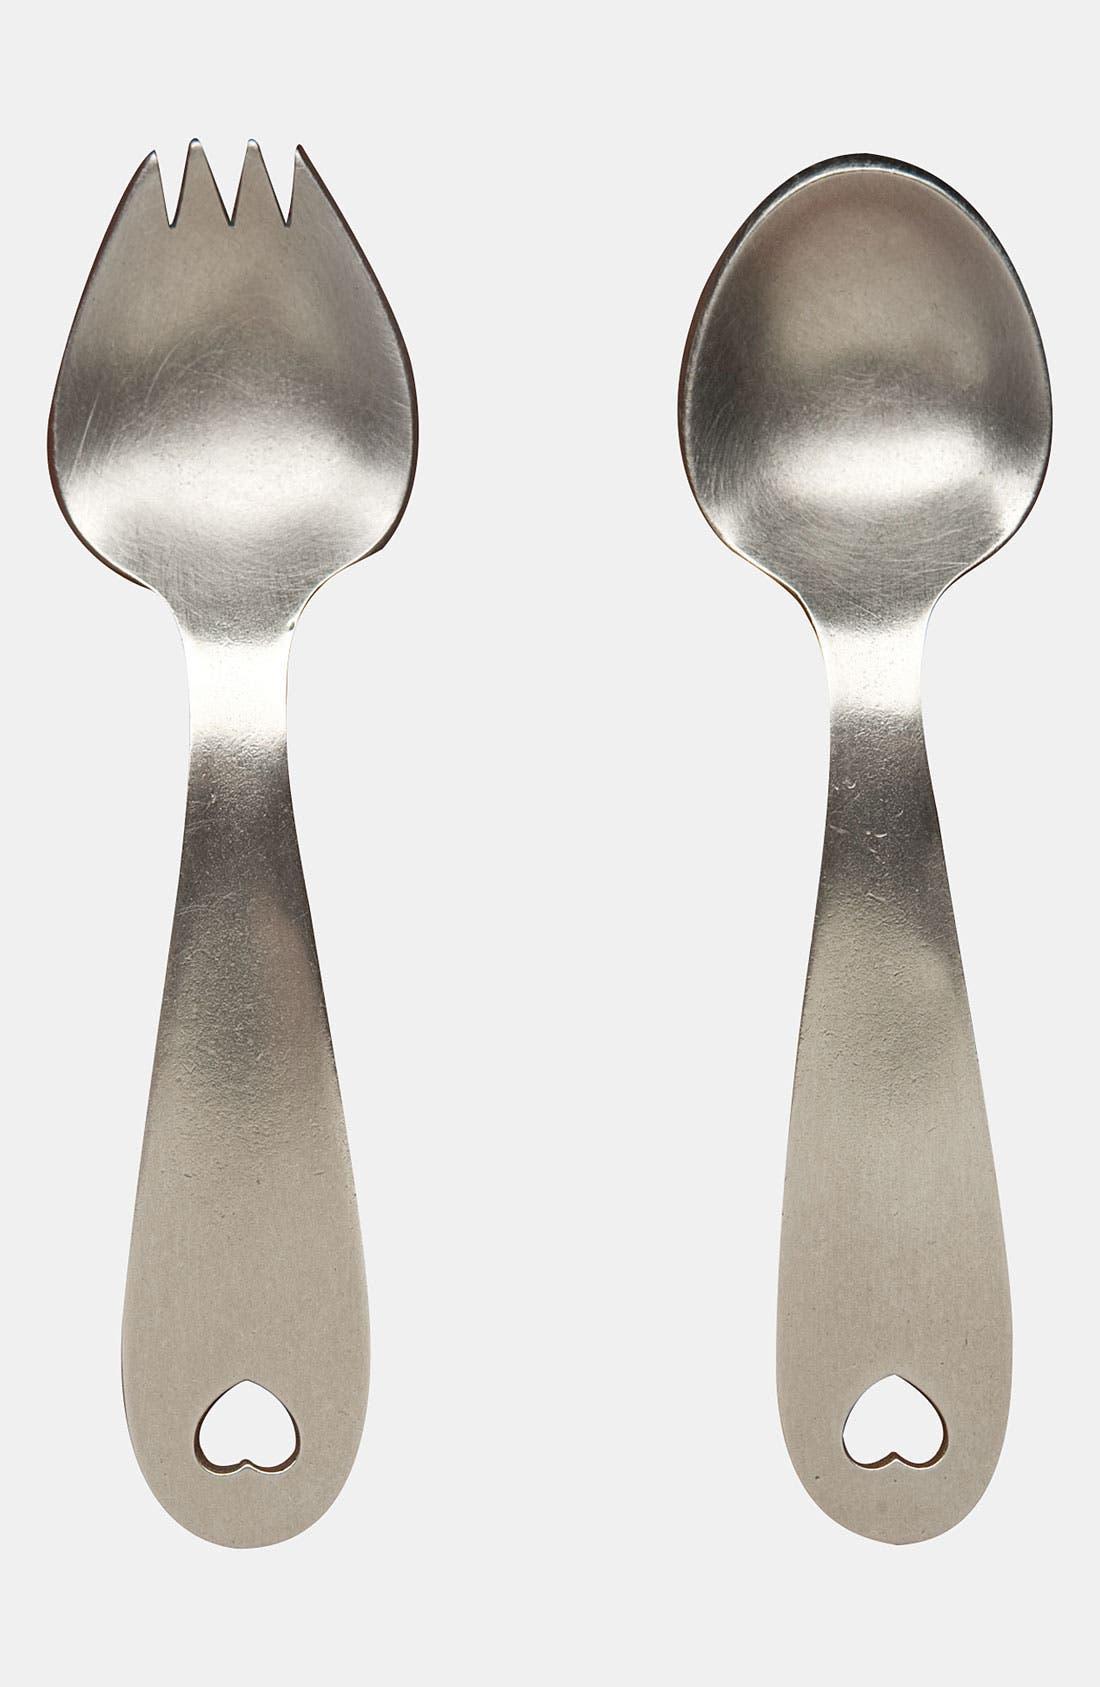 Main Image - Beehive Kitchenware 'Heart' Keepsake Spoon & Fork